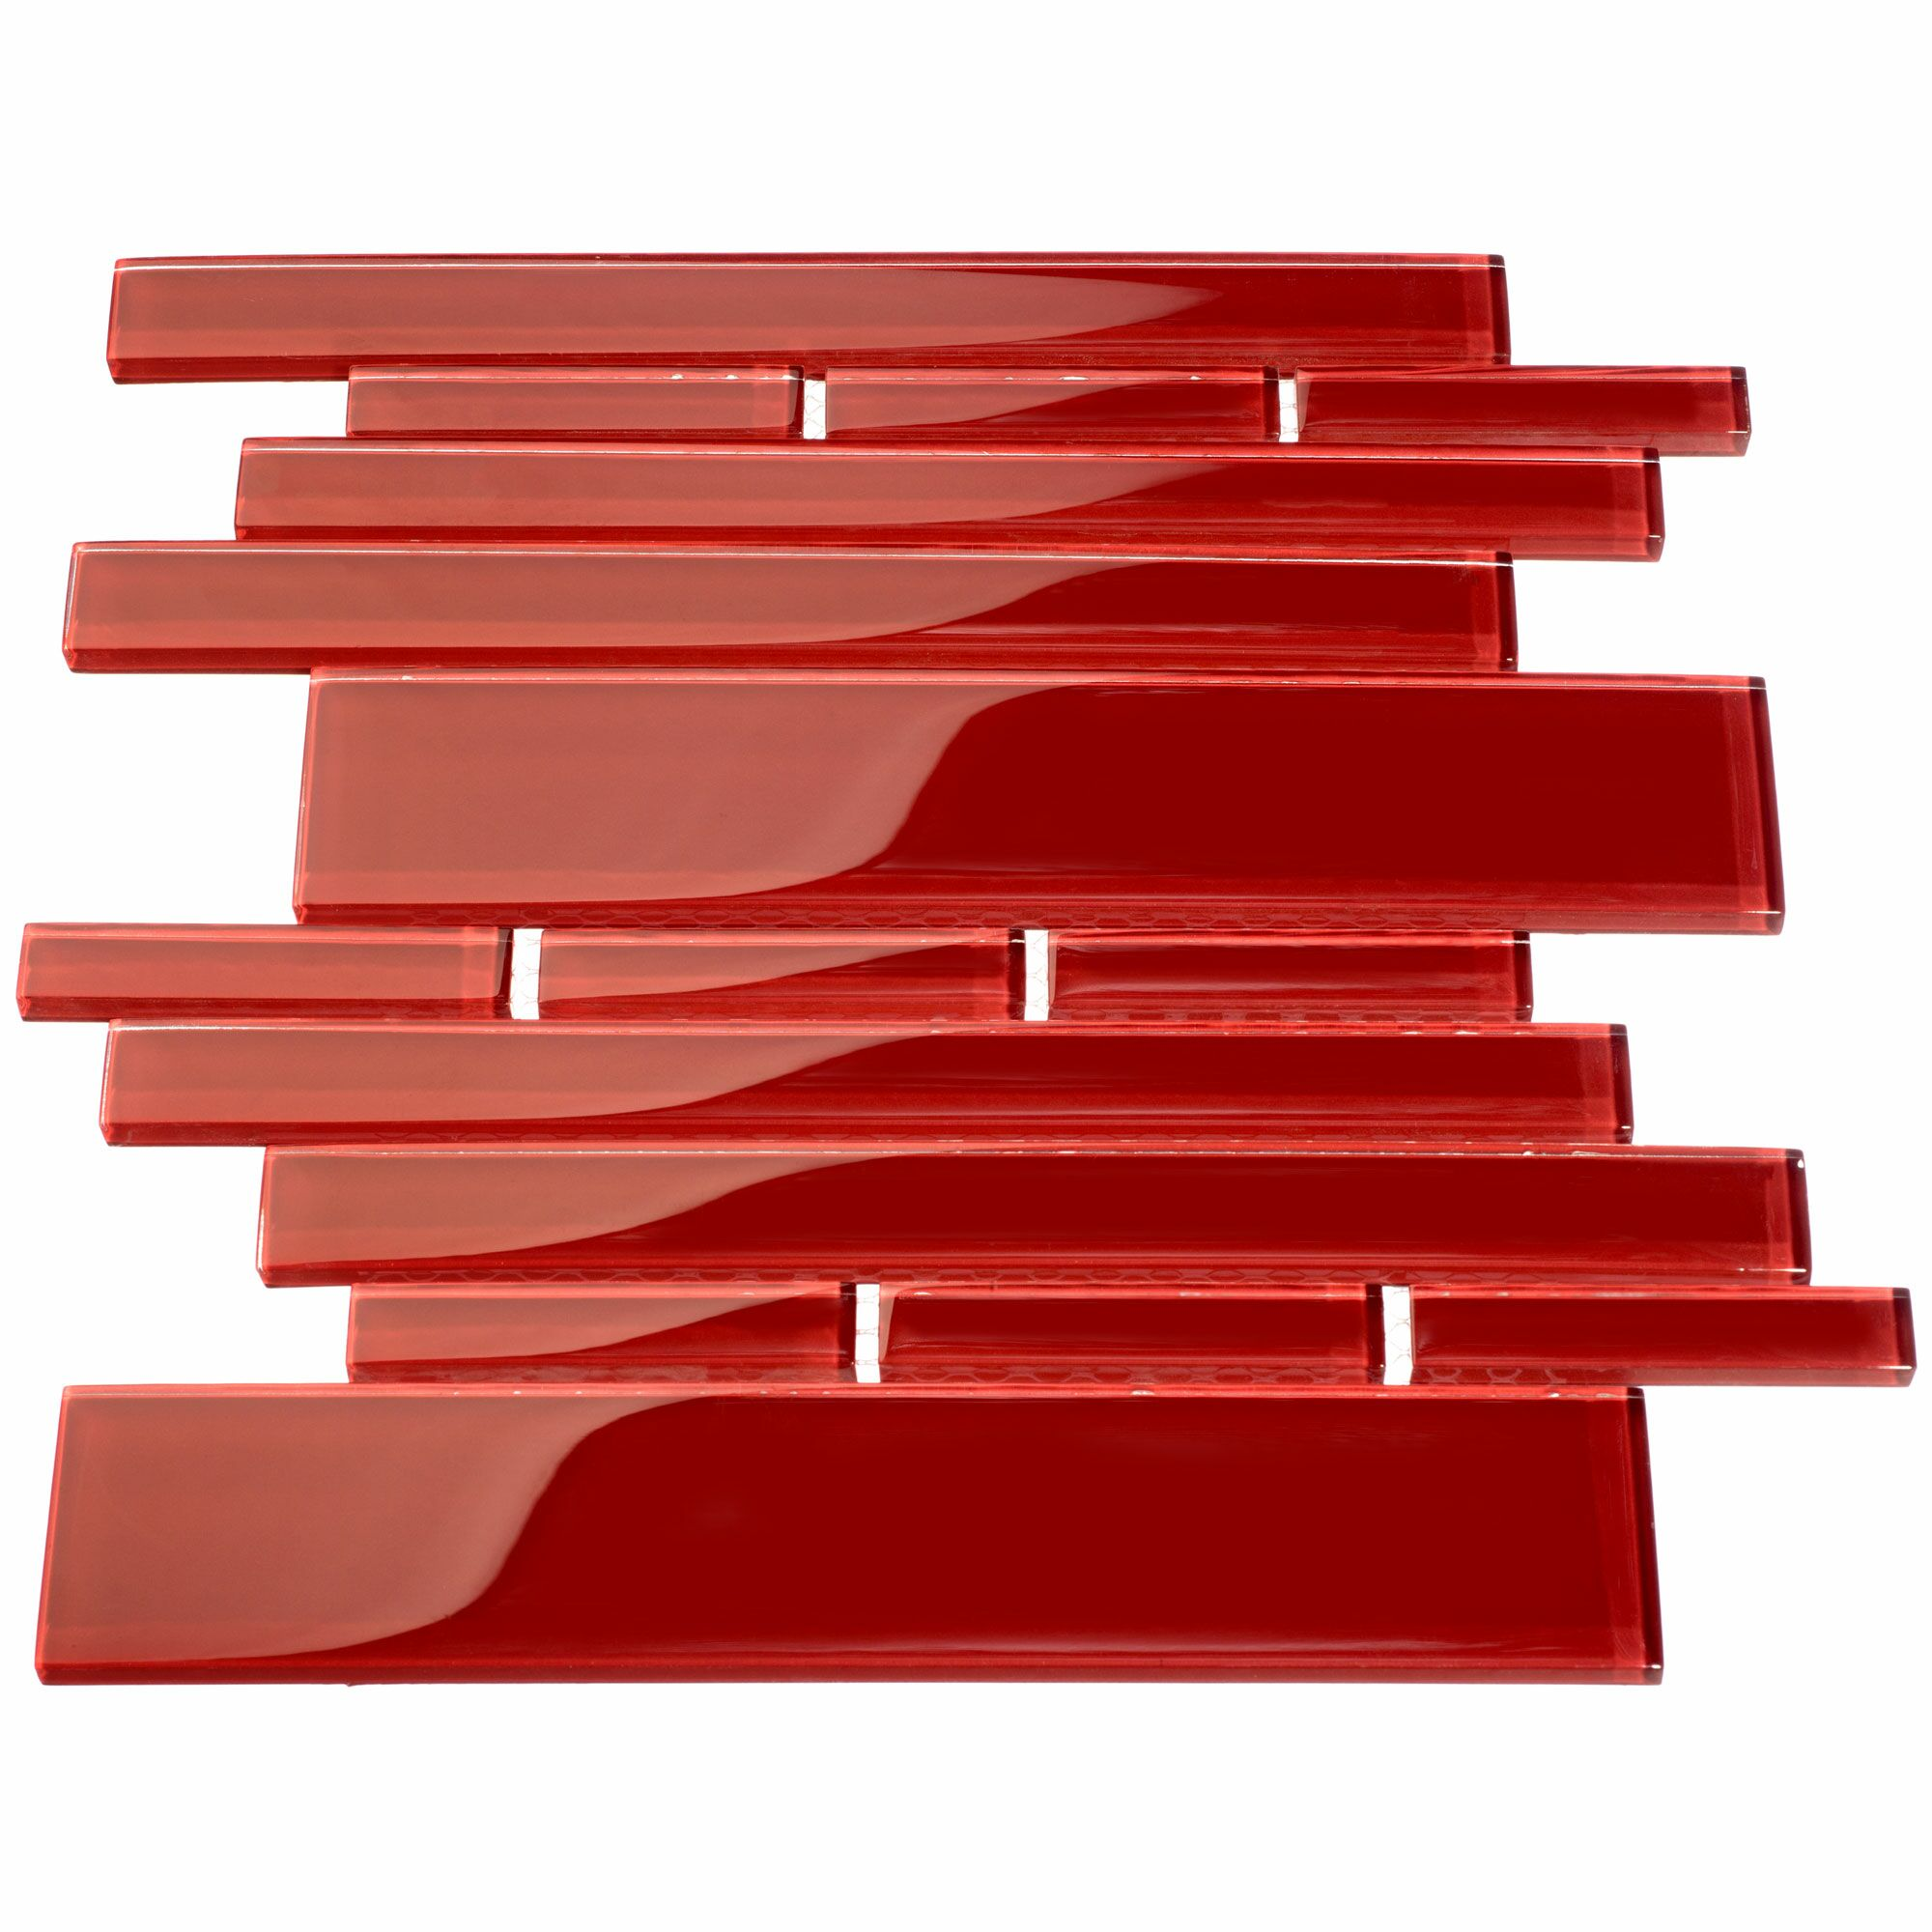 Club Random Sized Glass Mosaic Tile in Ruby Red